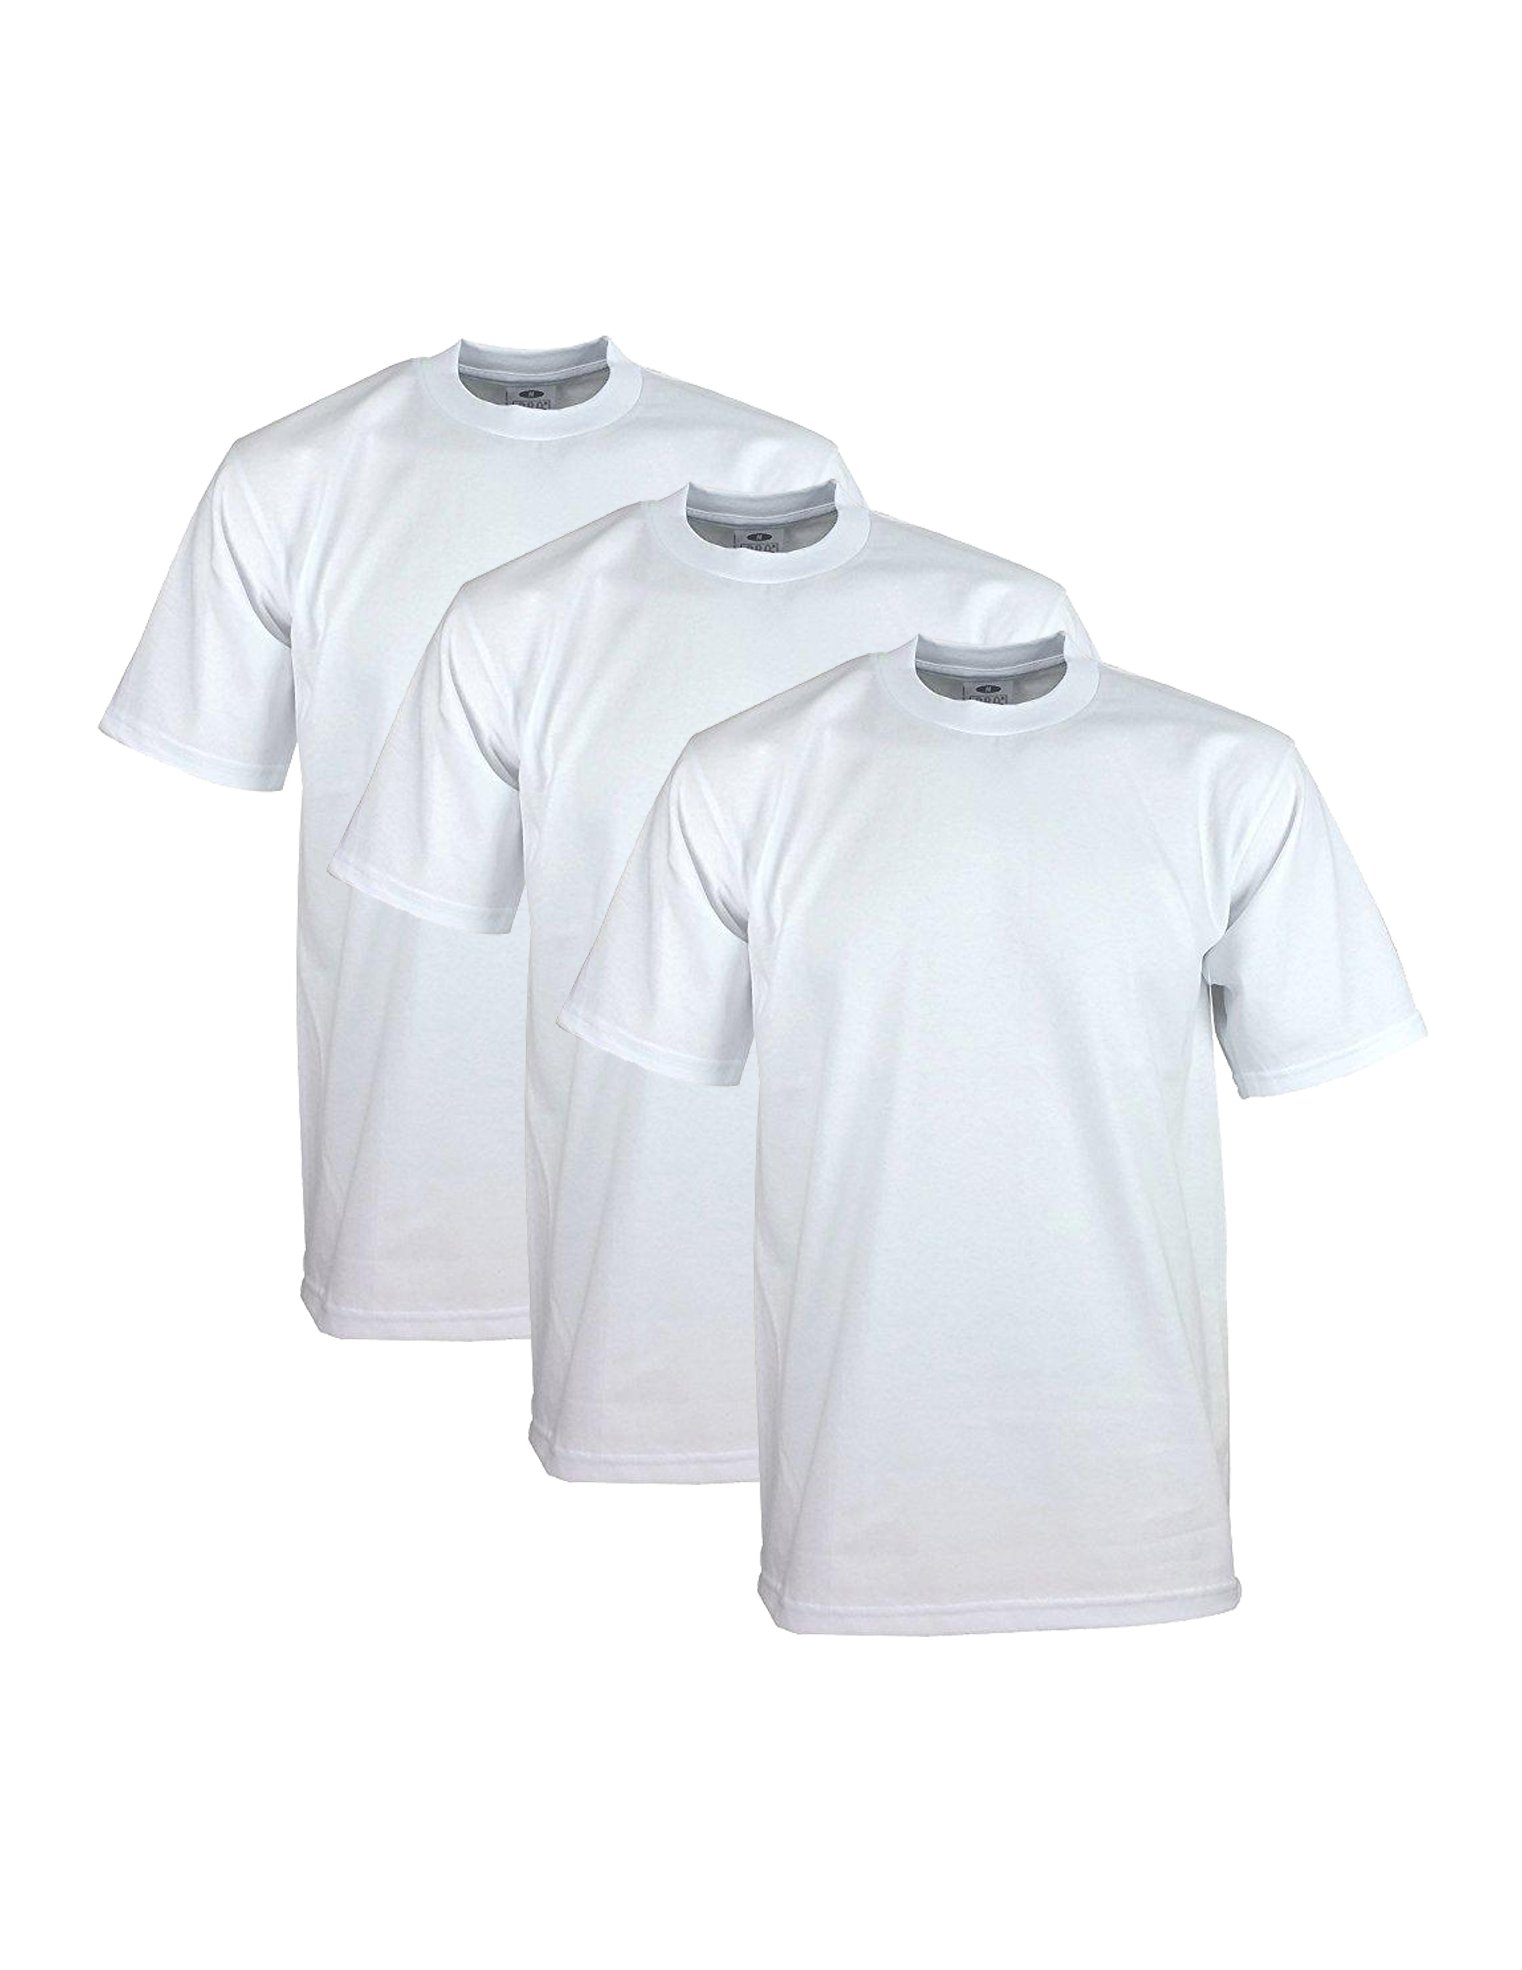 Pro Club Men's 3-Pack Heavyweight Cotton Short Sleeve Crew Neck T-Shirt